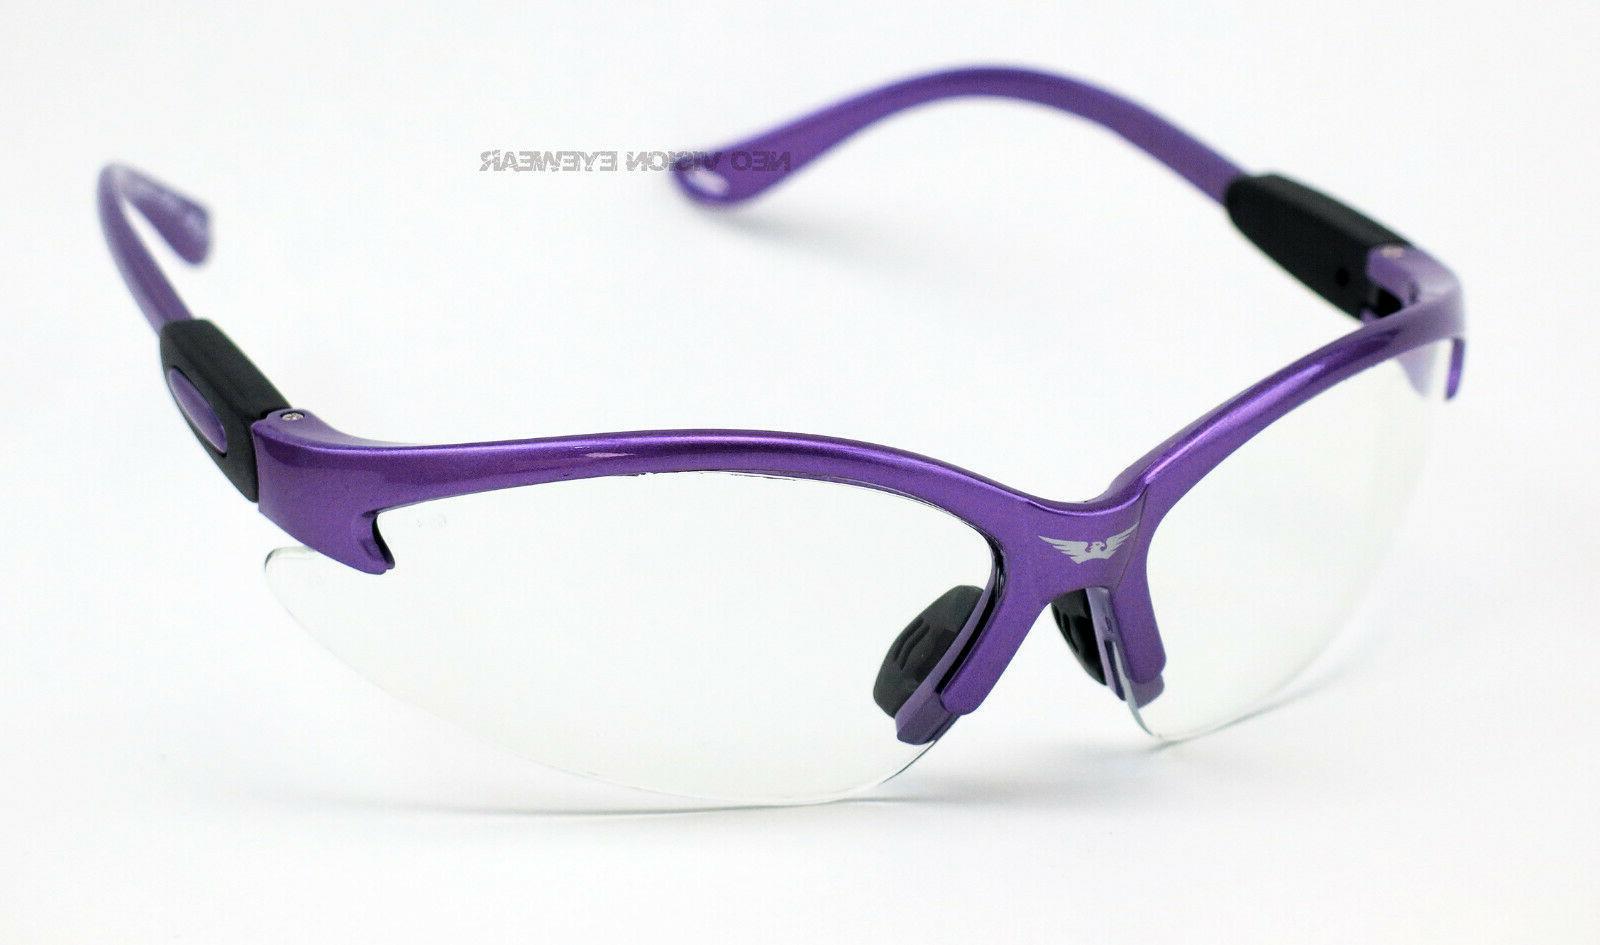 Global Cougar Frame Lens Glasses Z87+